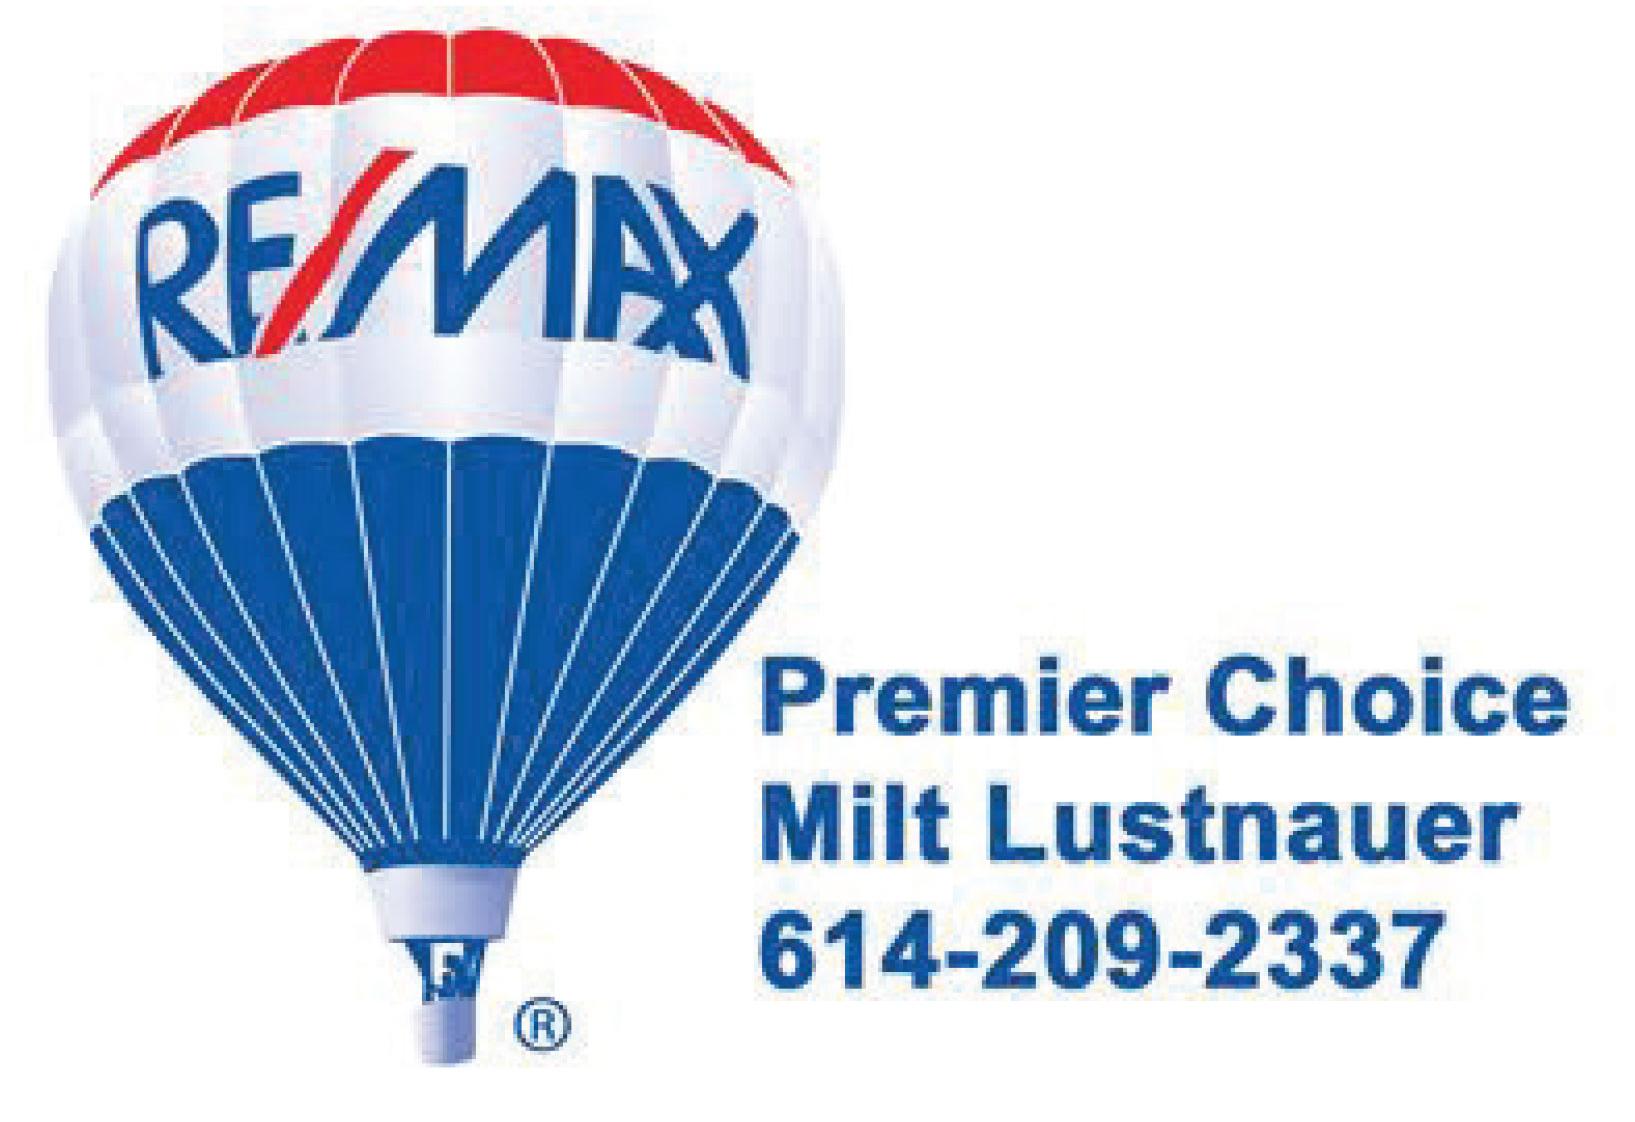 Re/Max Premier Choice - Milt Lustnauer